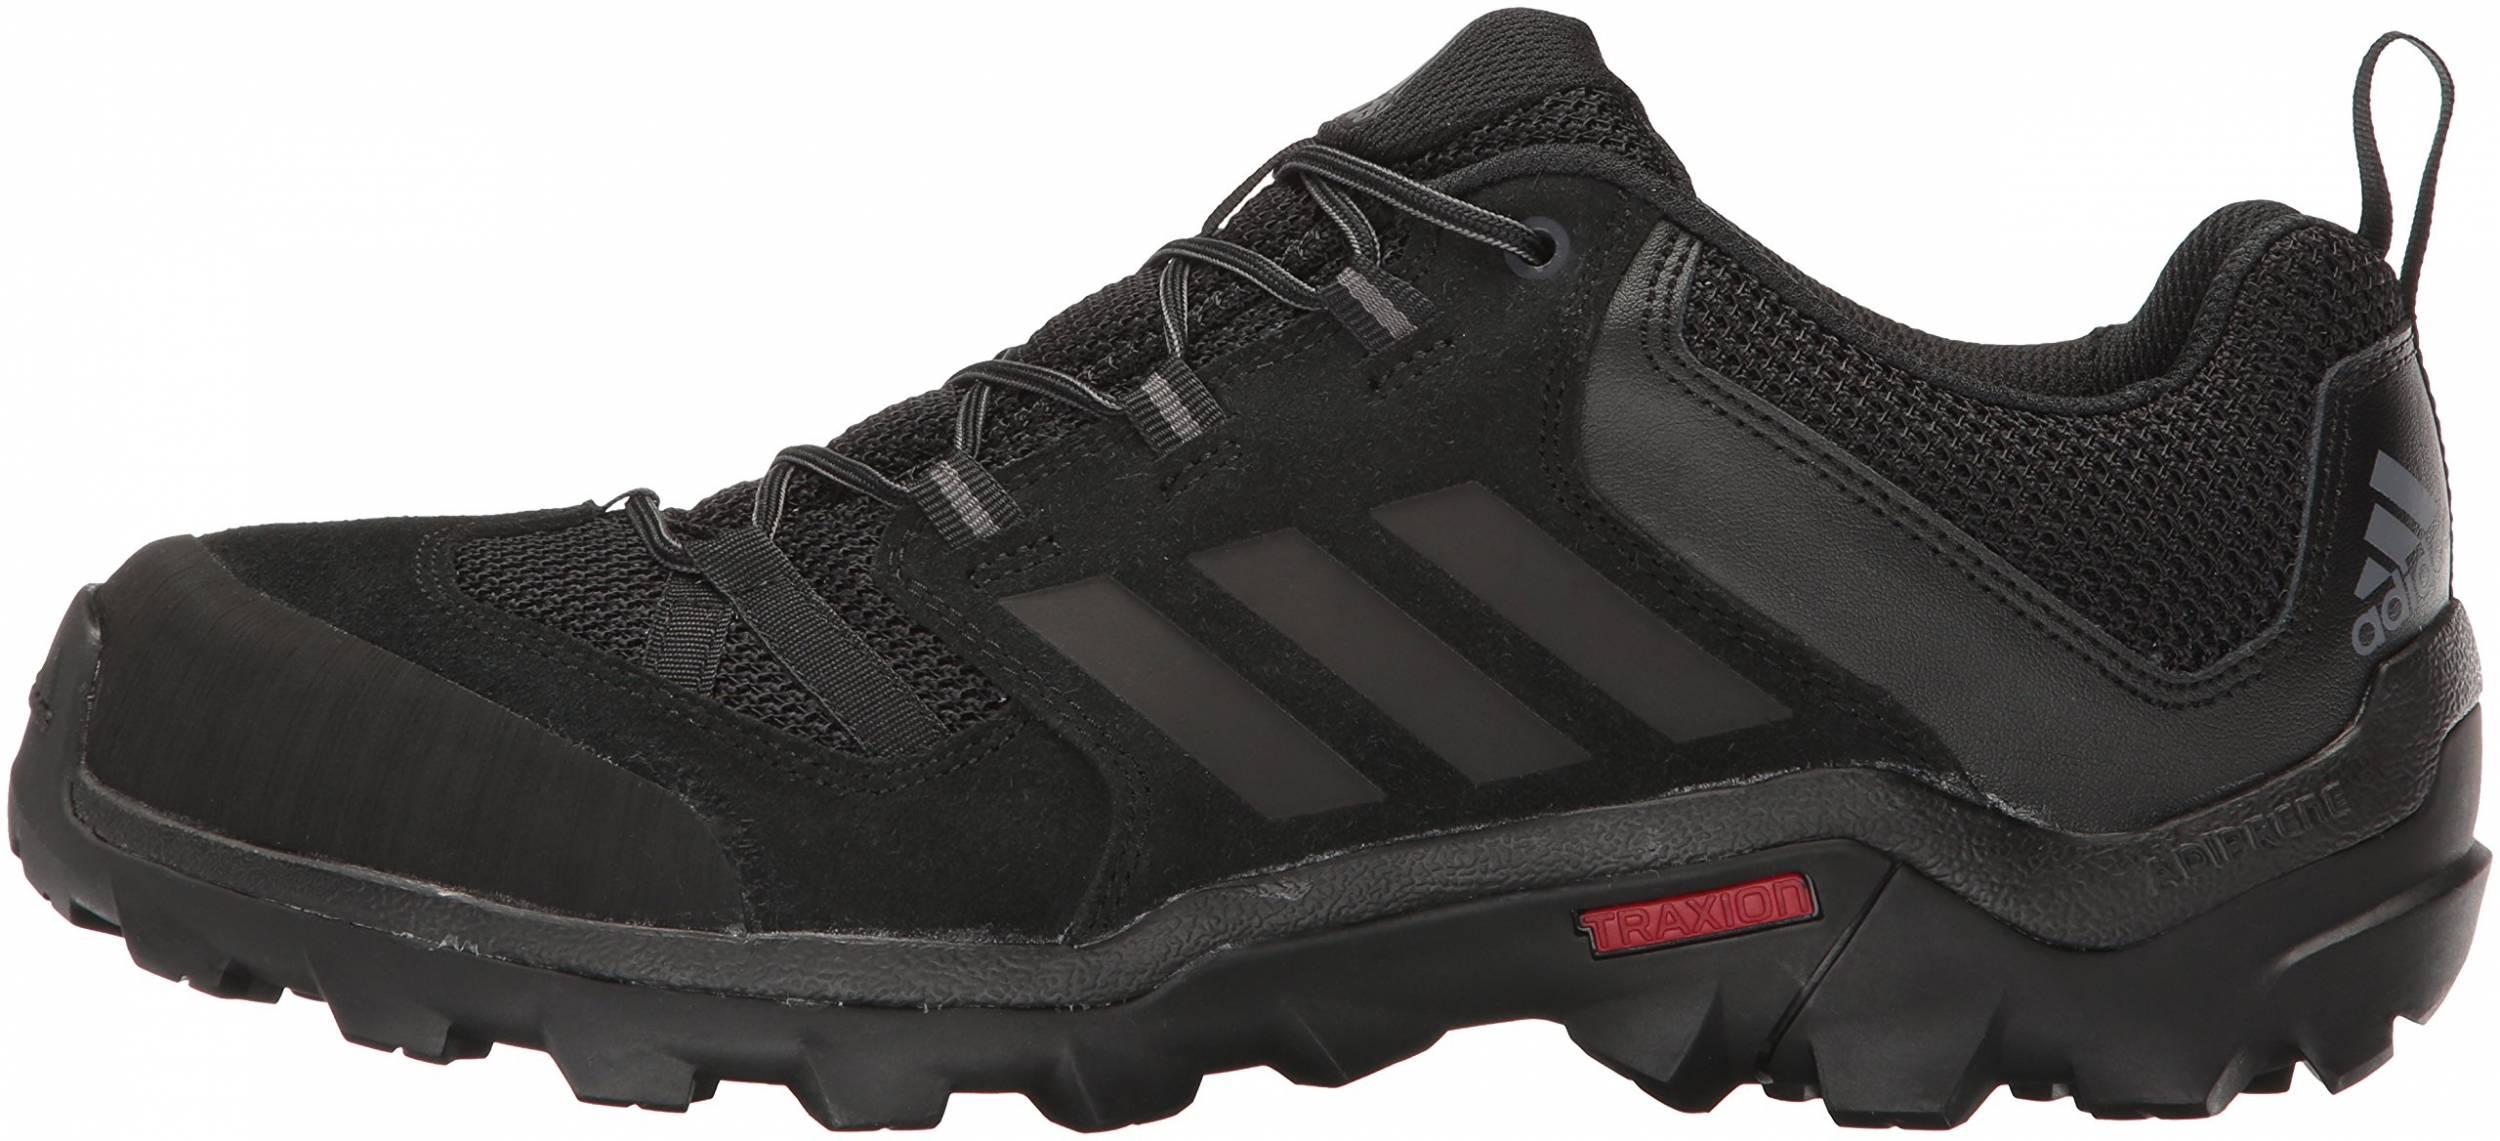 $100 + Review of Adidas Caprock   RunRepeat